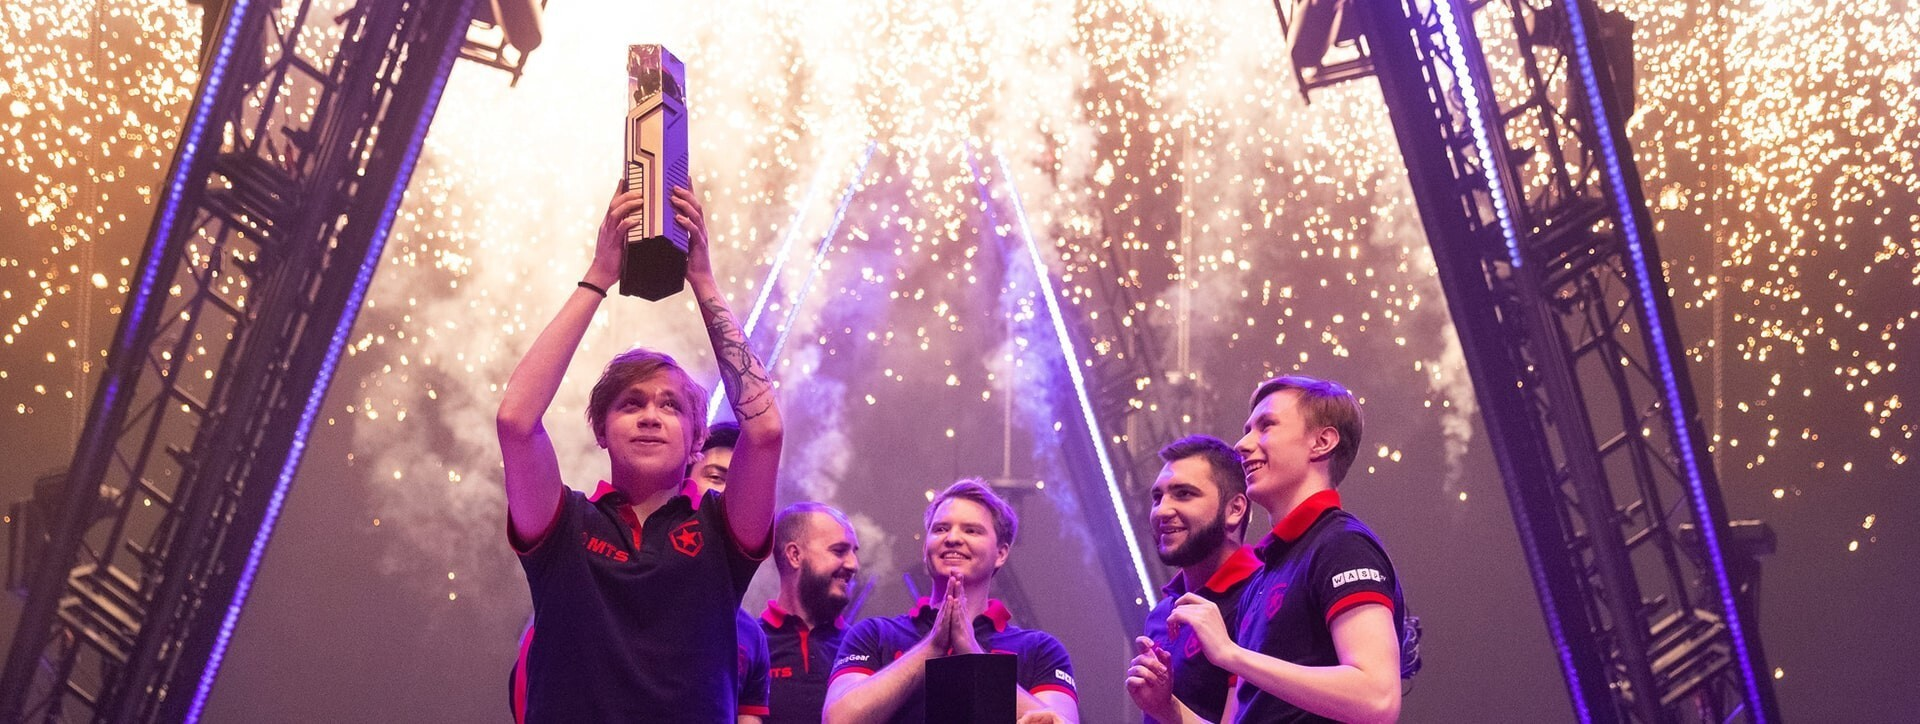 VCT Masters Berlin Sona Erdi! Şampiyon Gambit!